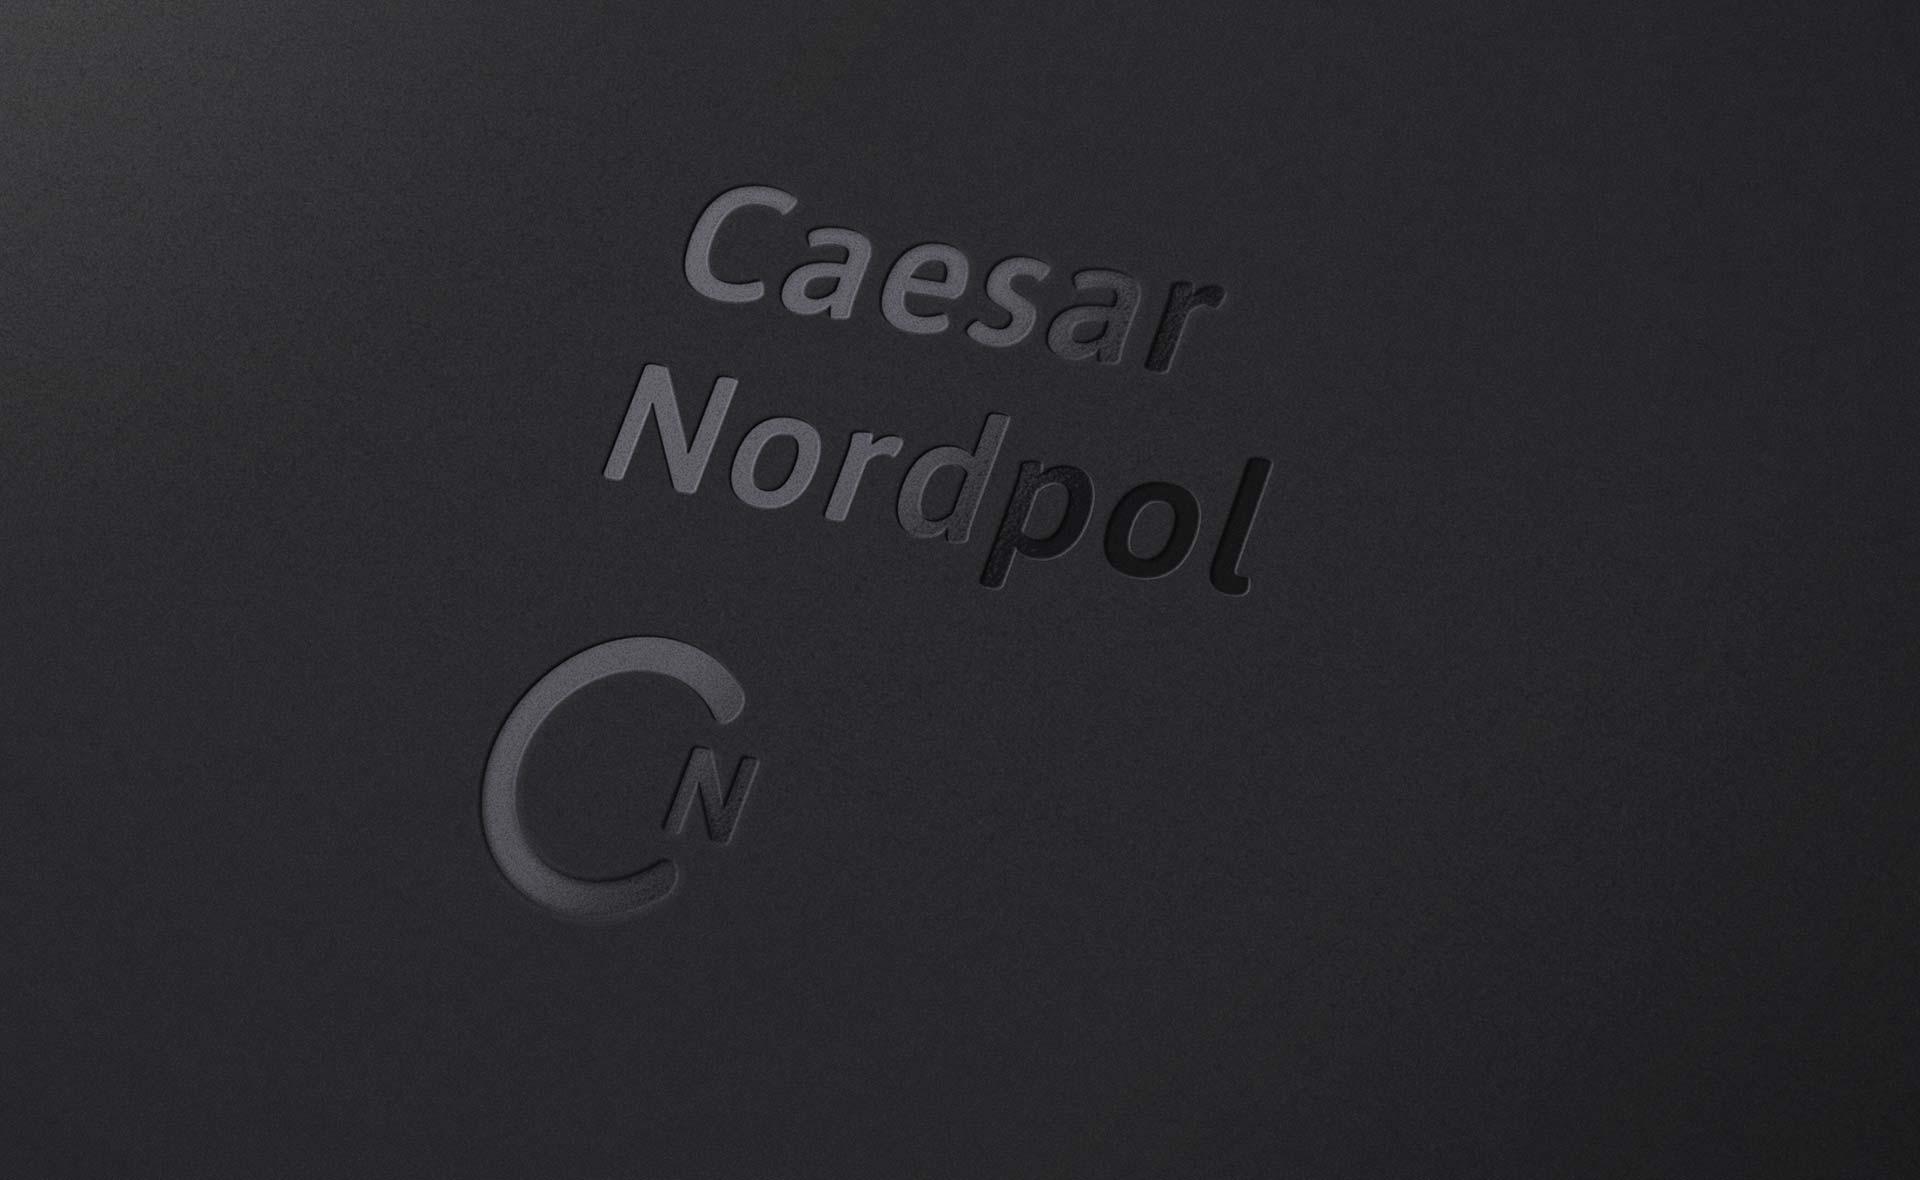 Artfatale-Case-CaesarNordpol-1920×1180-4